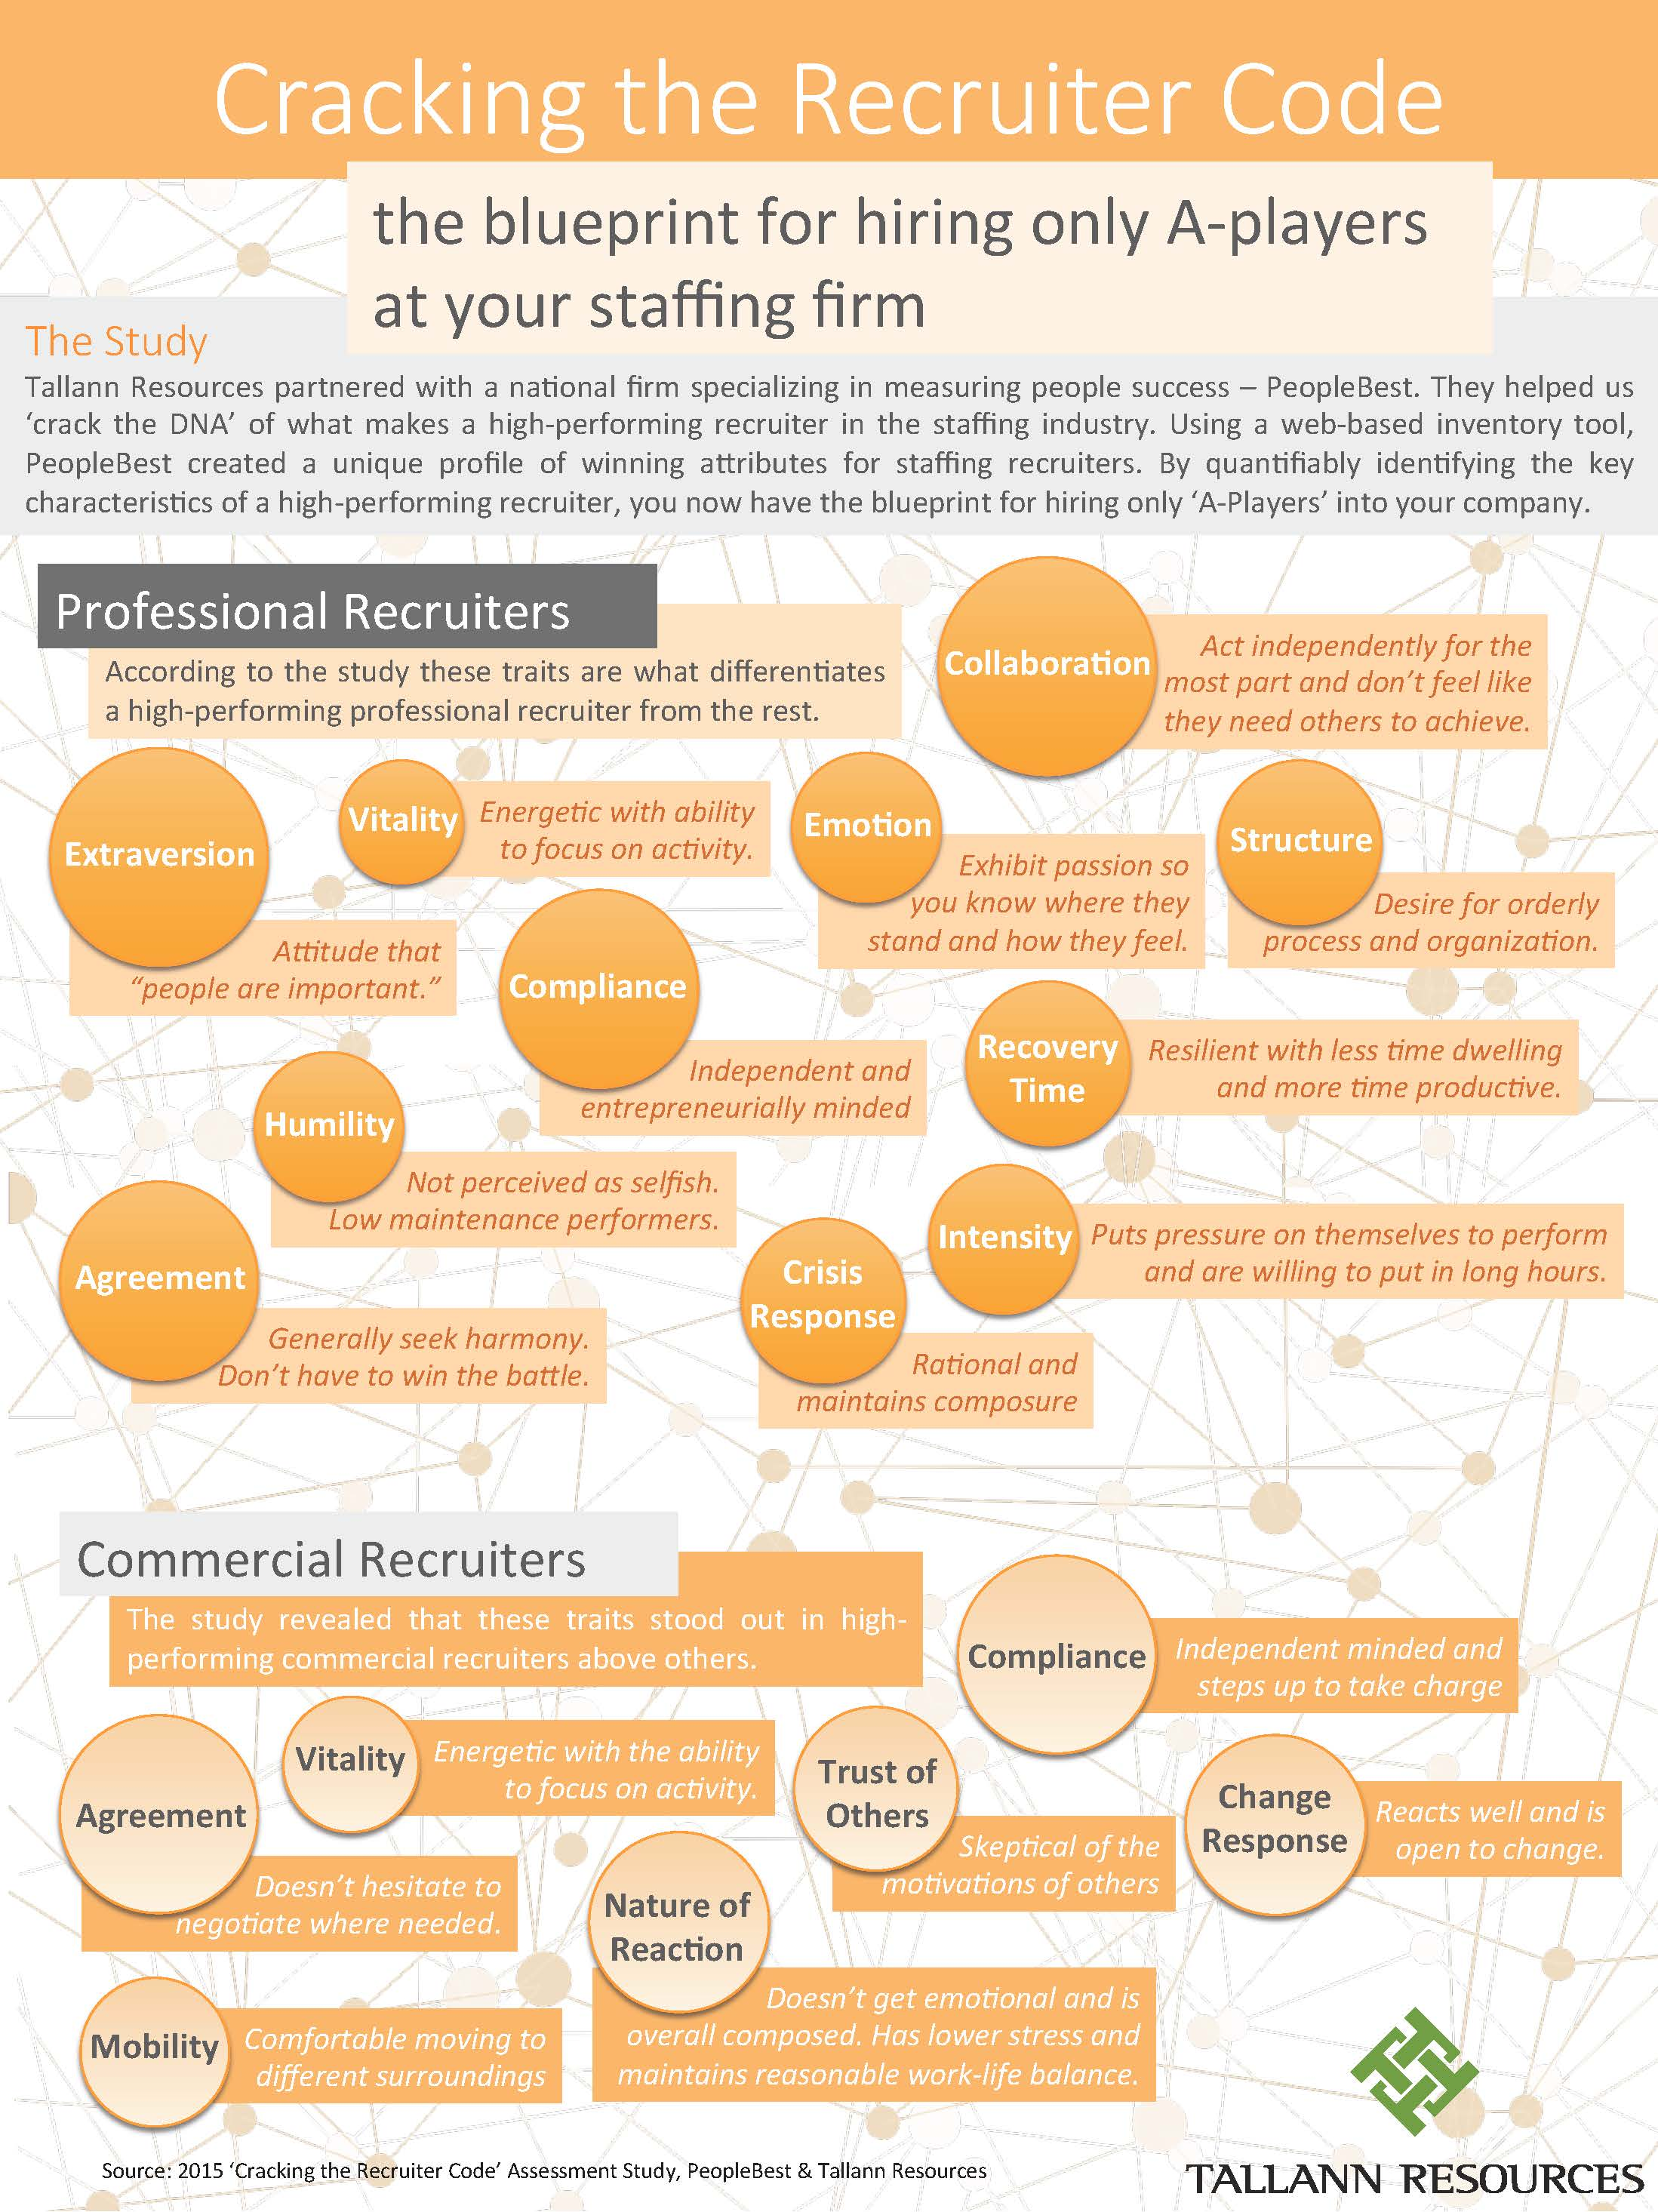 Cracking_the_Recruiter_Code_-_Infographic.jpg